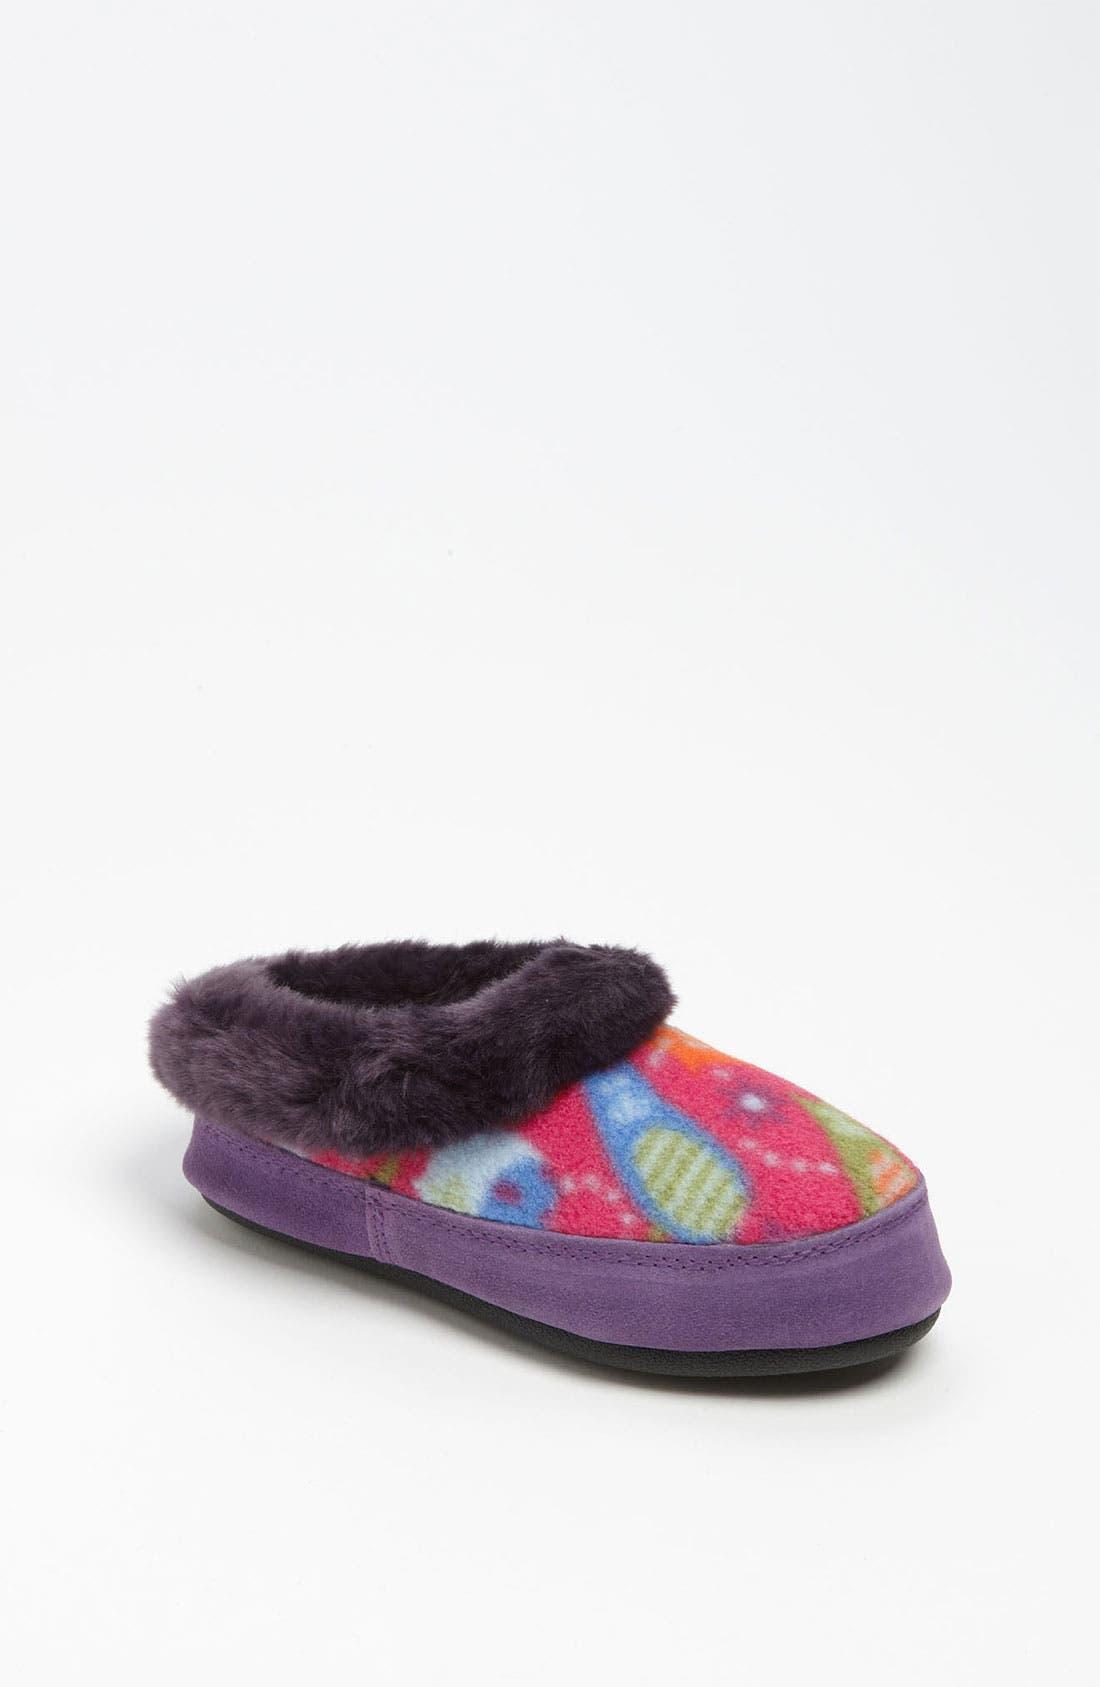 Alternate Image 1 Selected - Acorn 'Hopscotch' Slipper (Toddler, Little Kid & Big Kid)